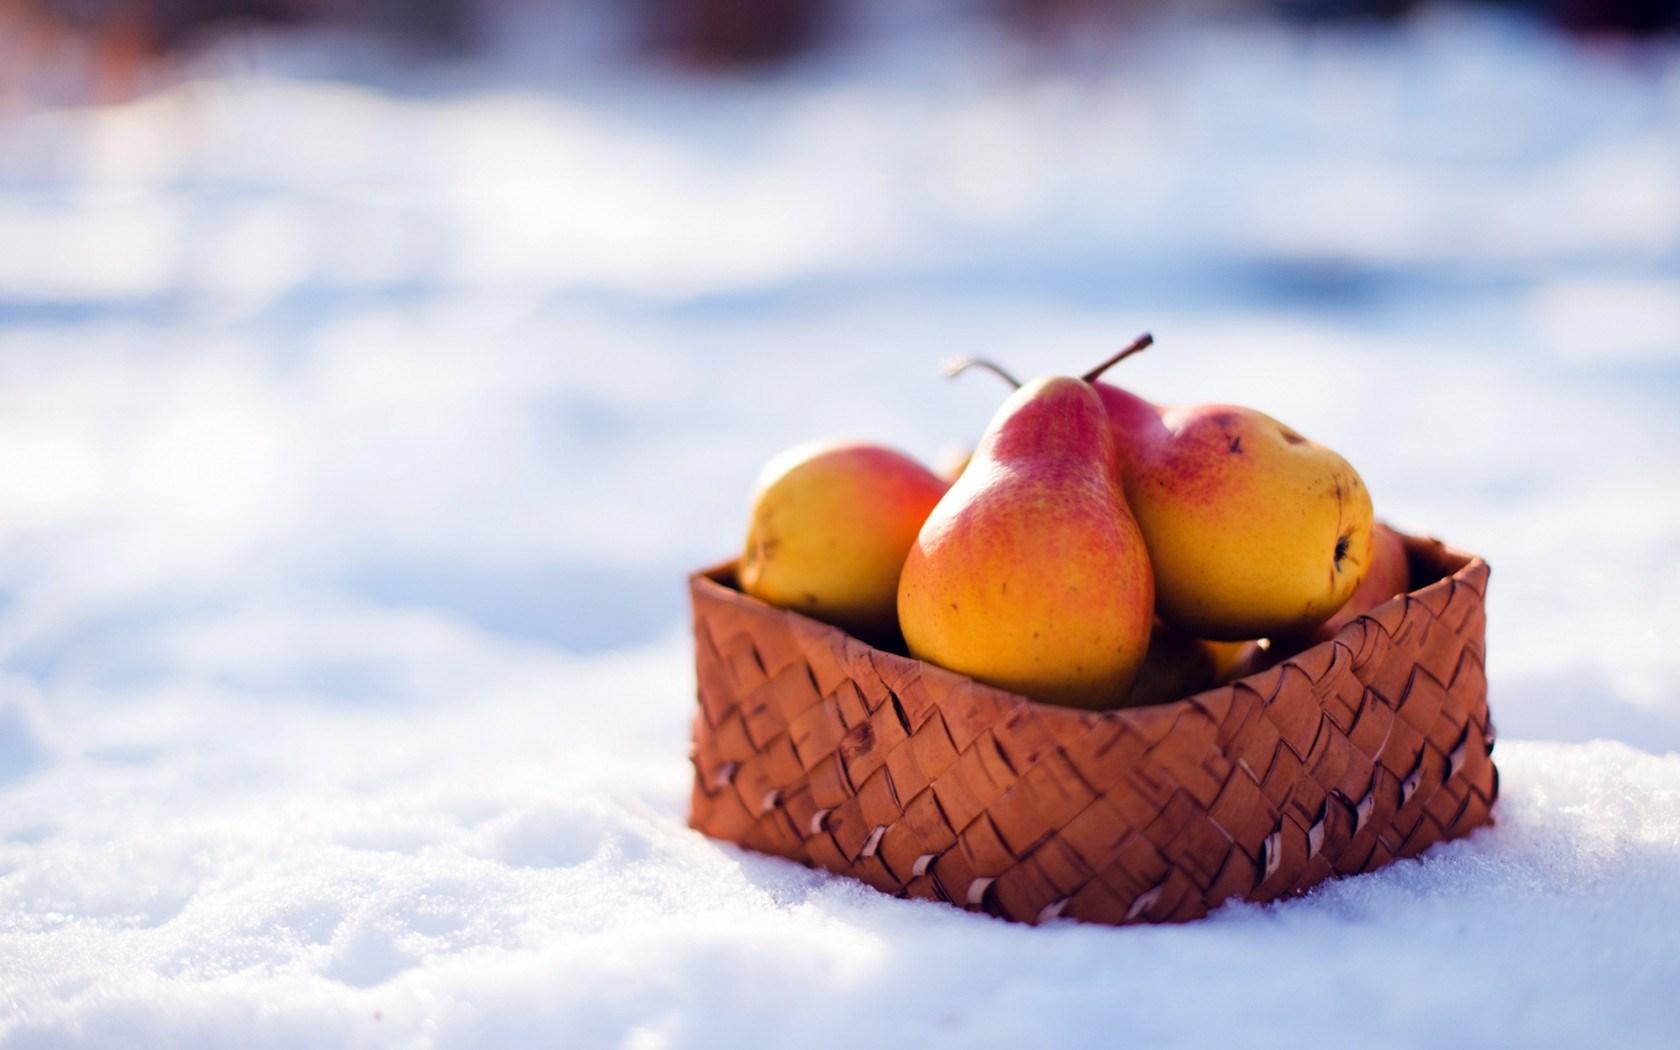 Pears Fruit Basket Winter Snow